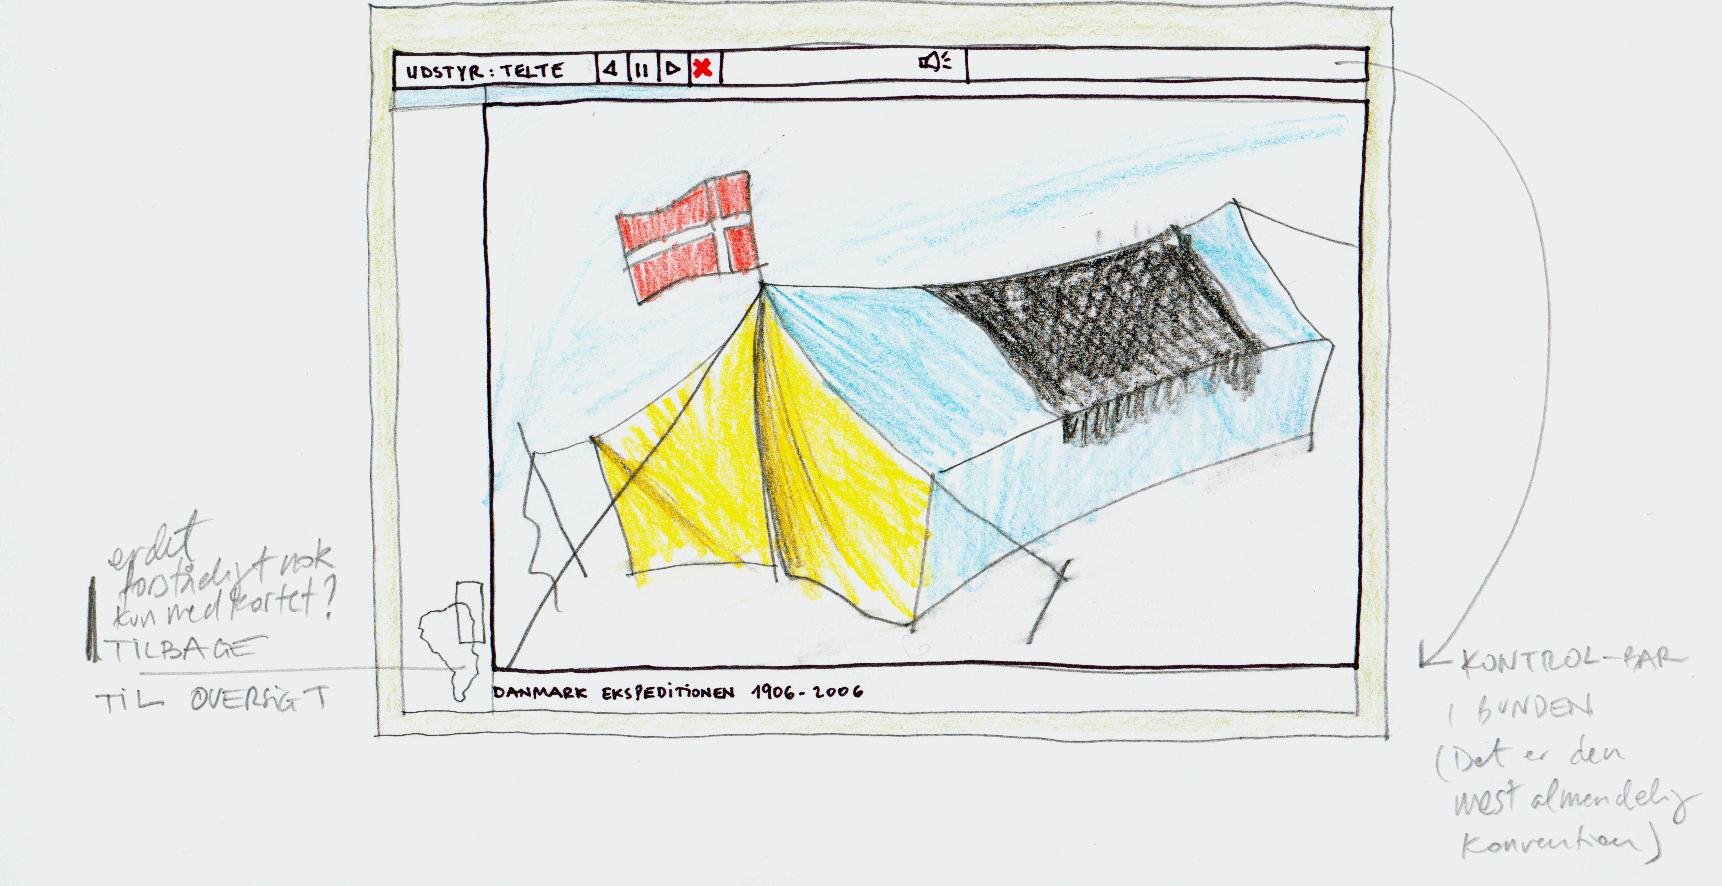 Storyboard til DRs Danmark Ekspeditionen 3